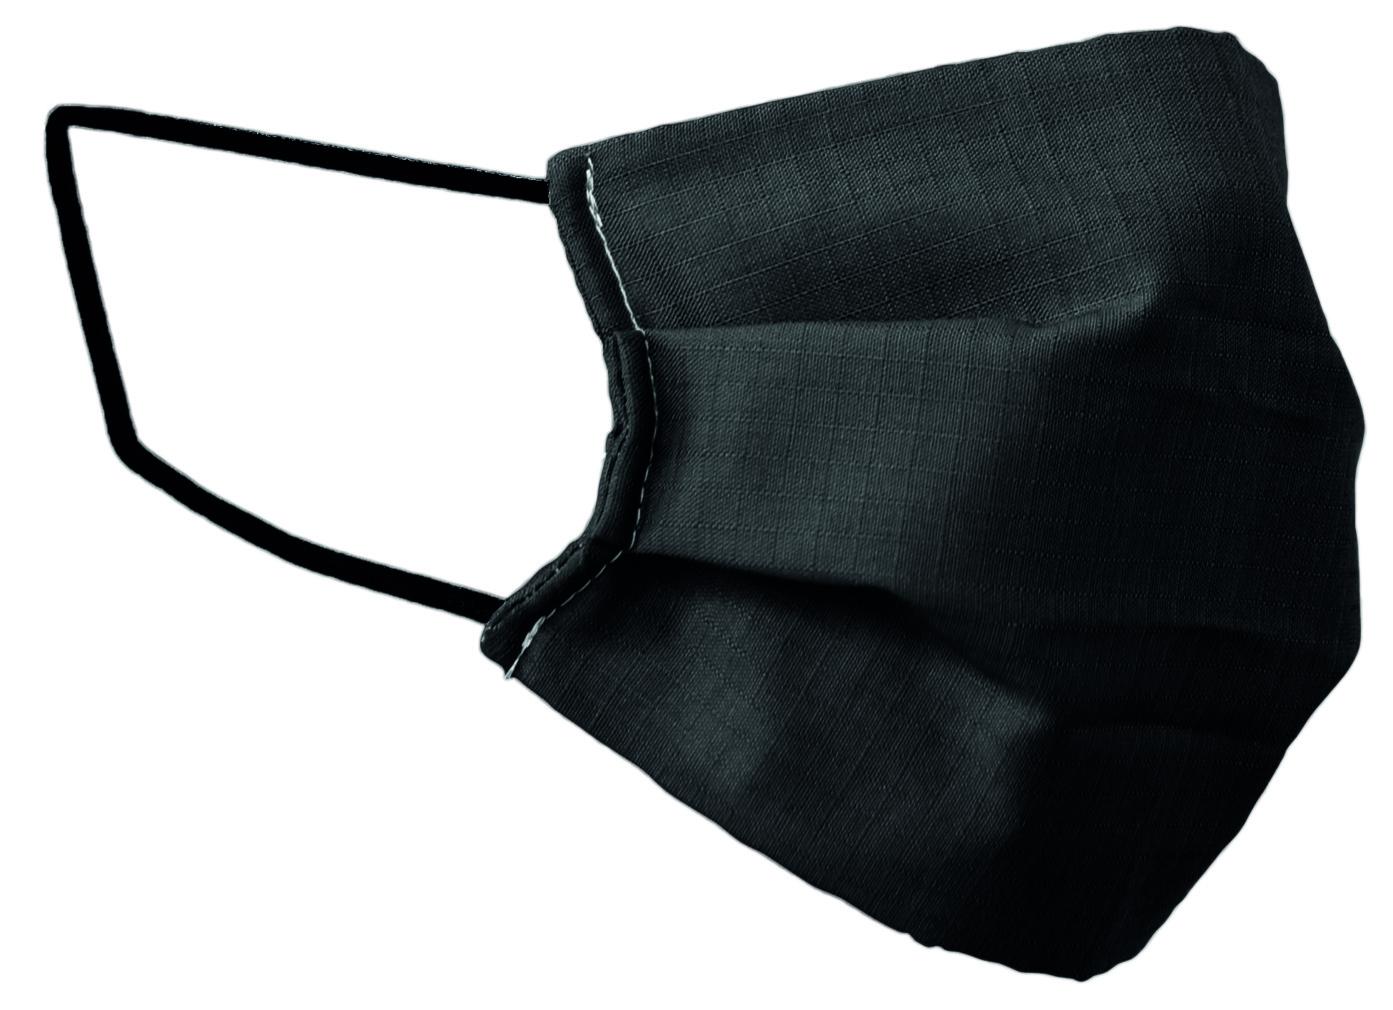 Atemschutzmaske - community mask